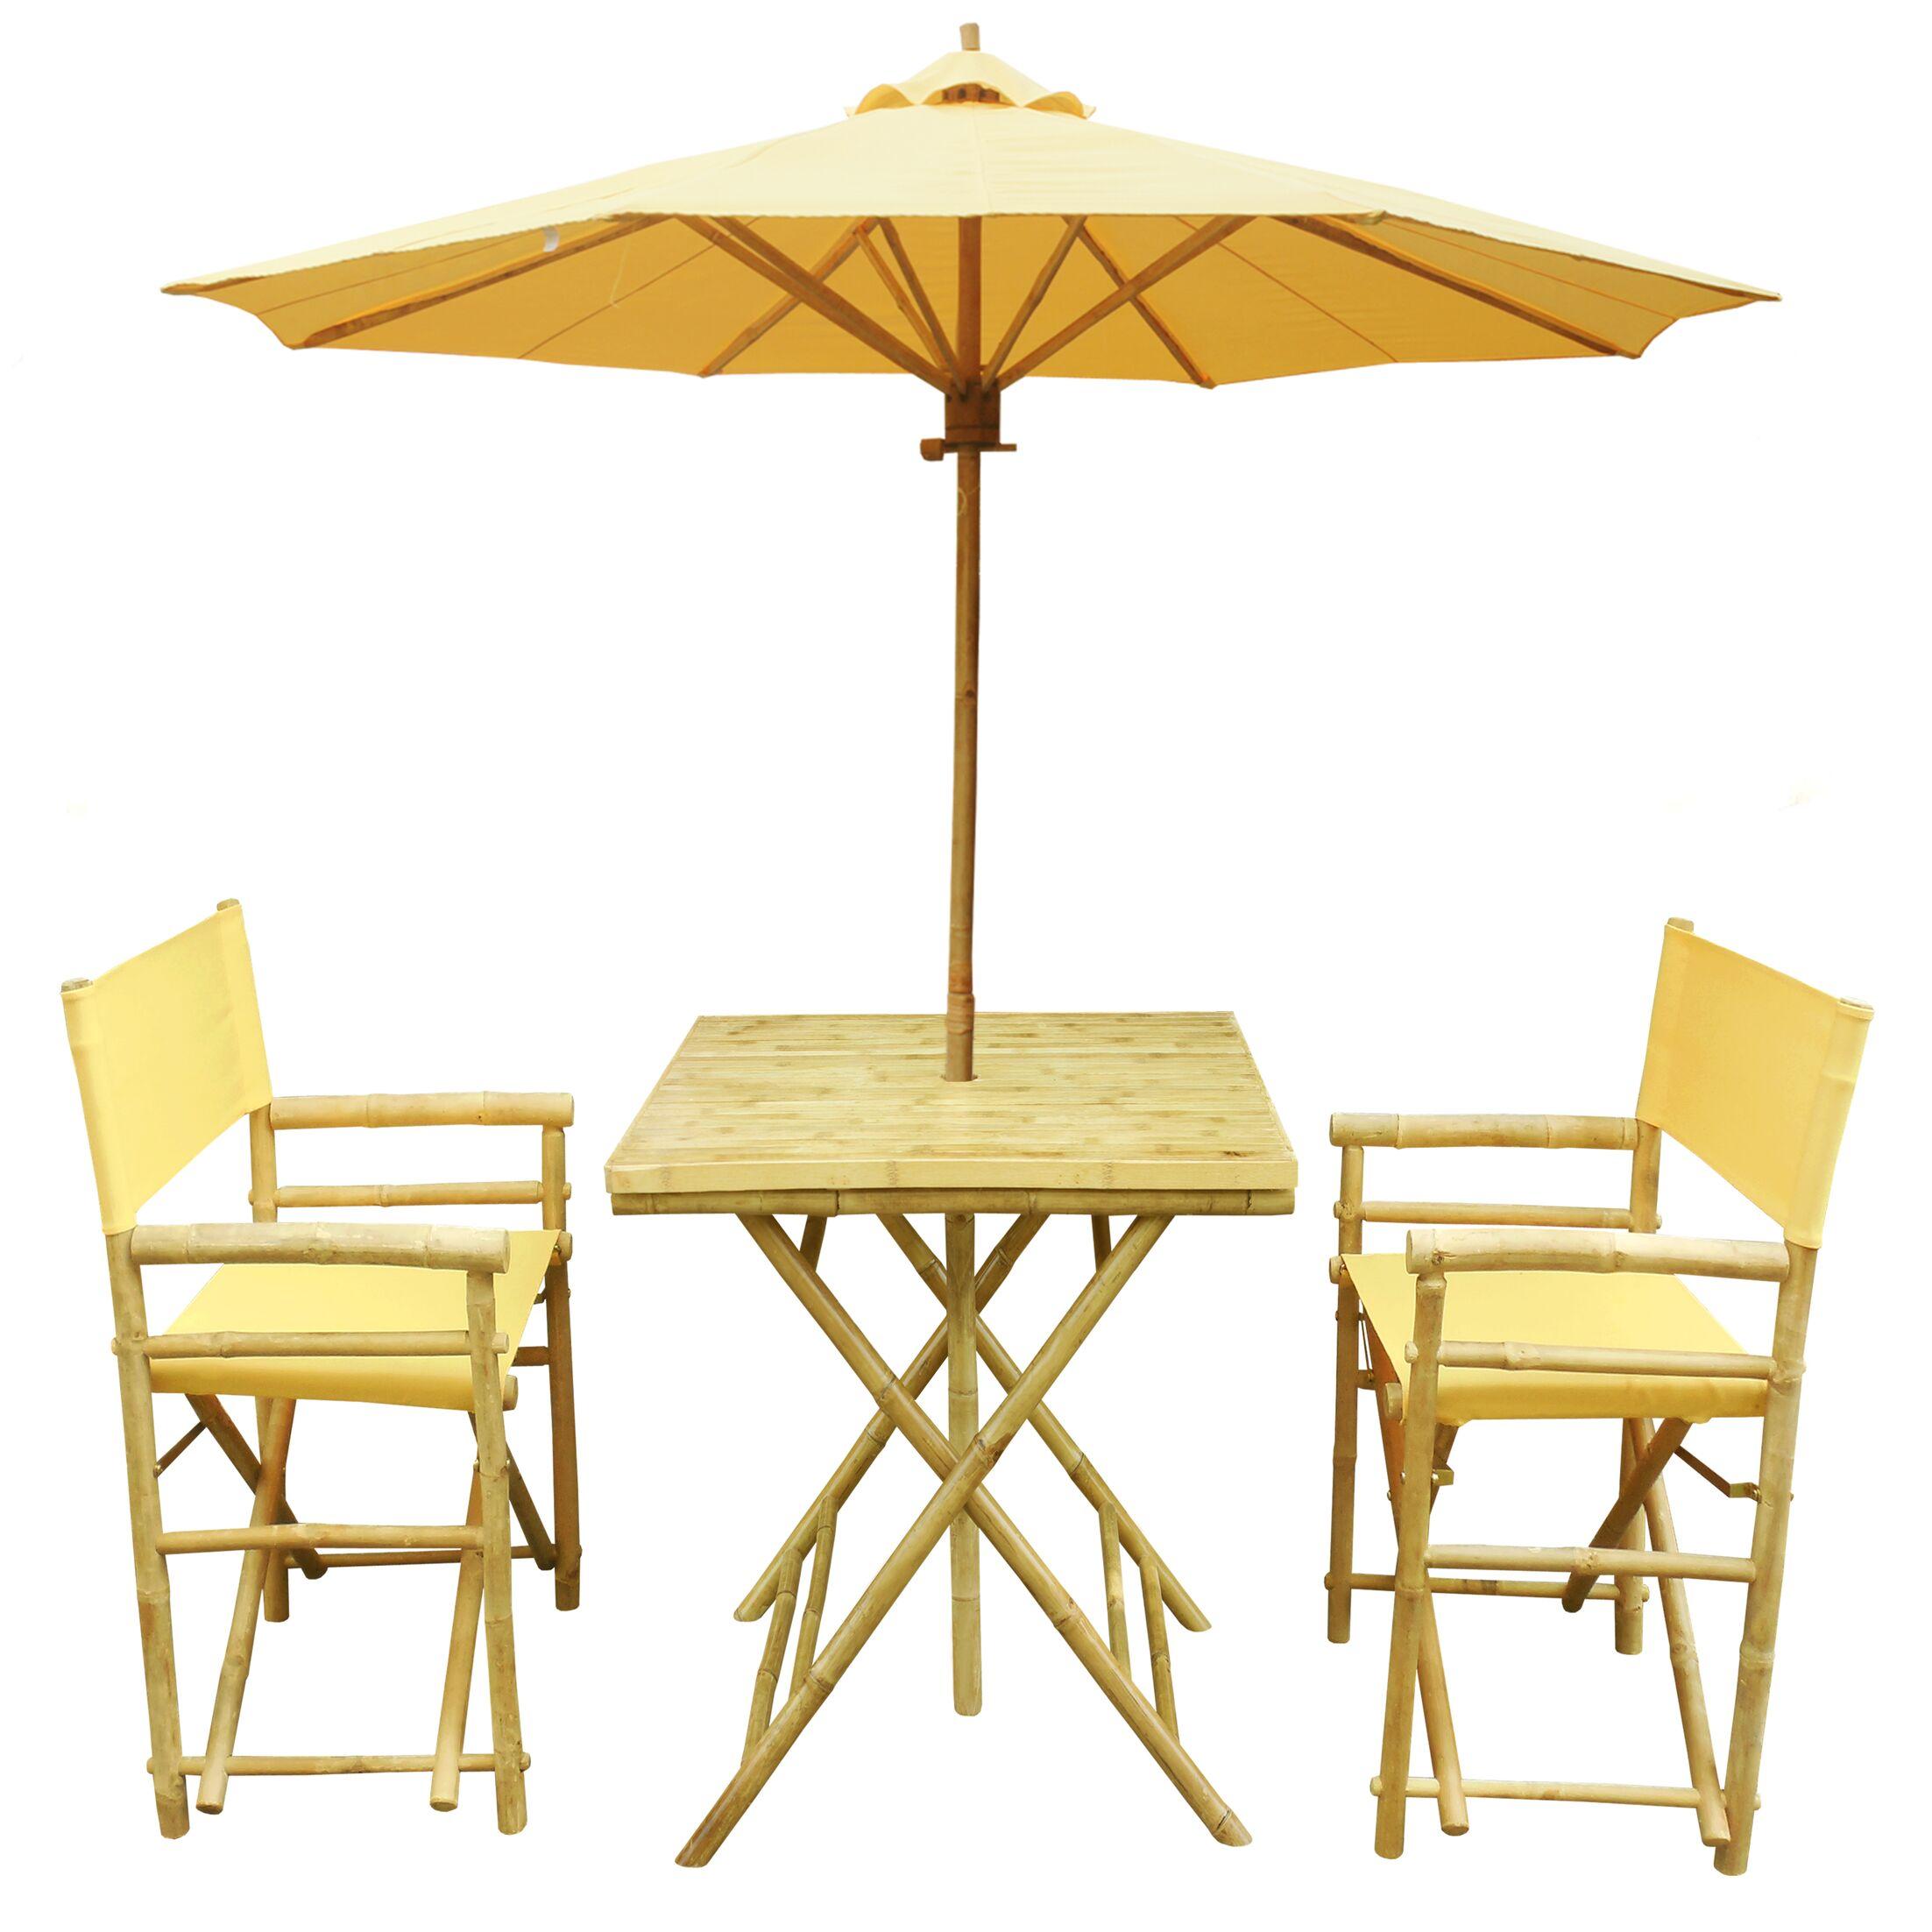 Sinta Bamboo 3 Piece Bistro Set with Umbrella Color: Yellow